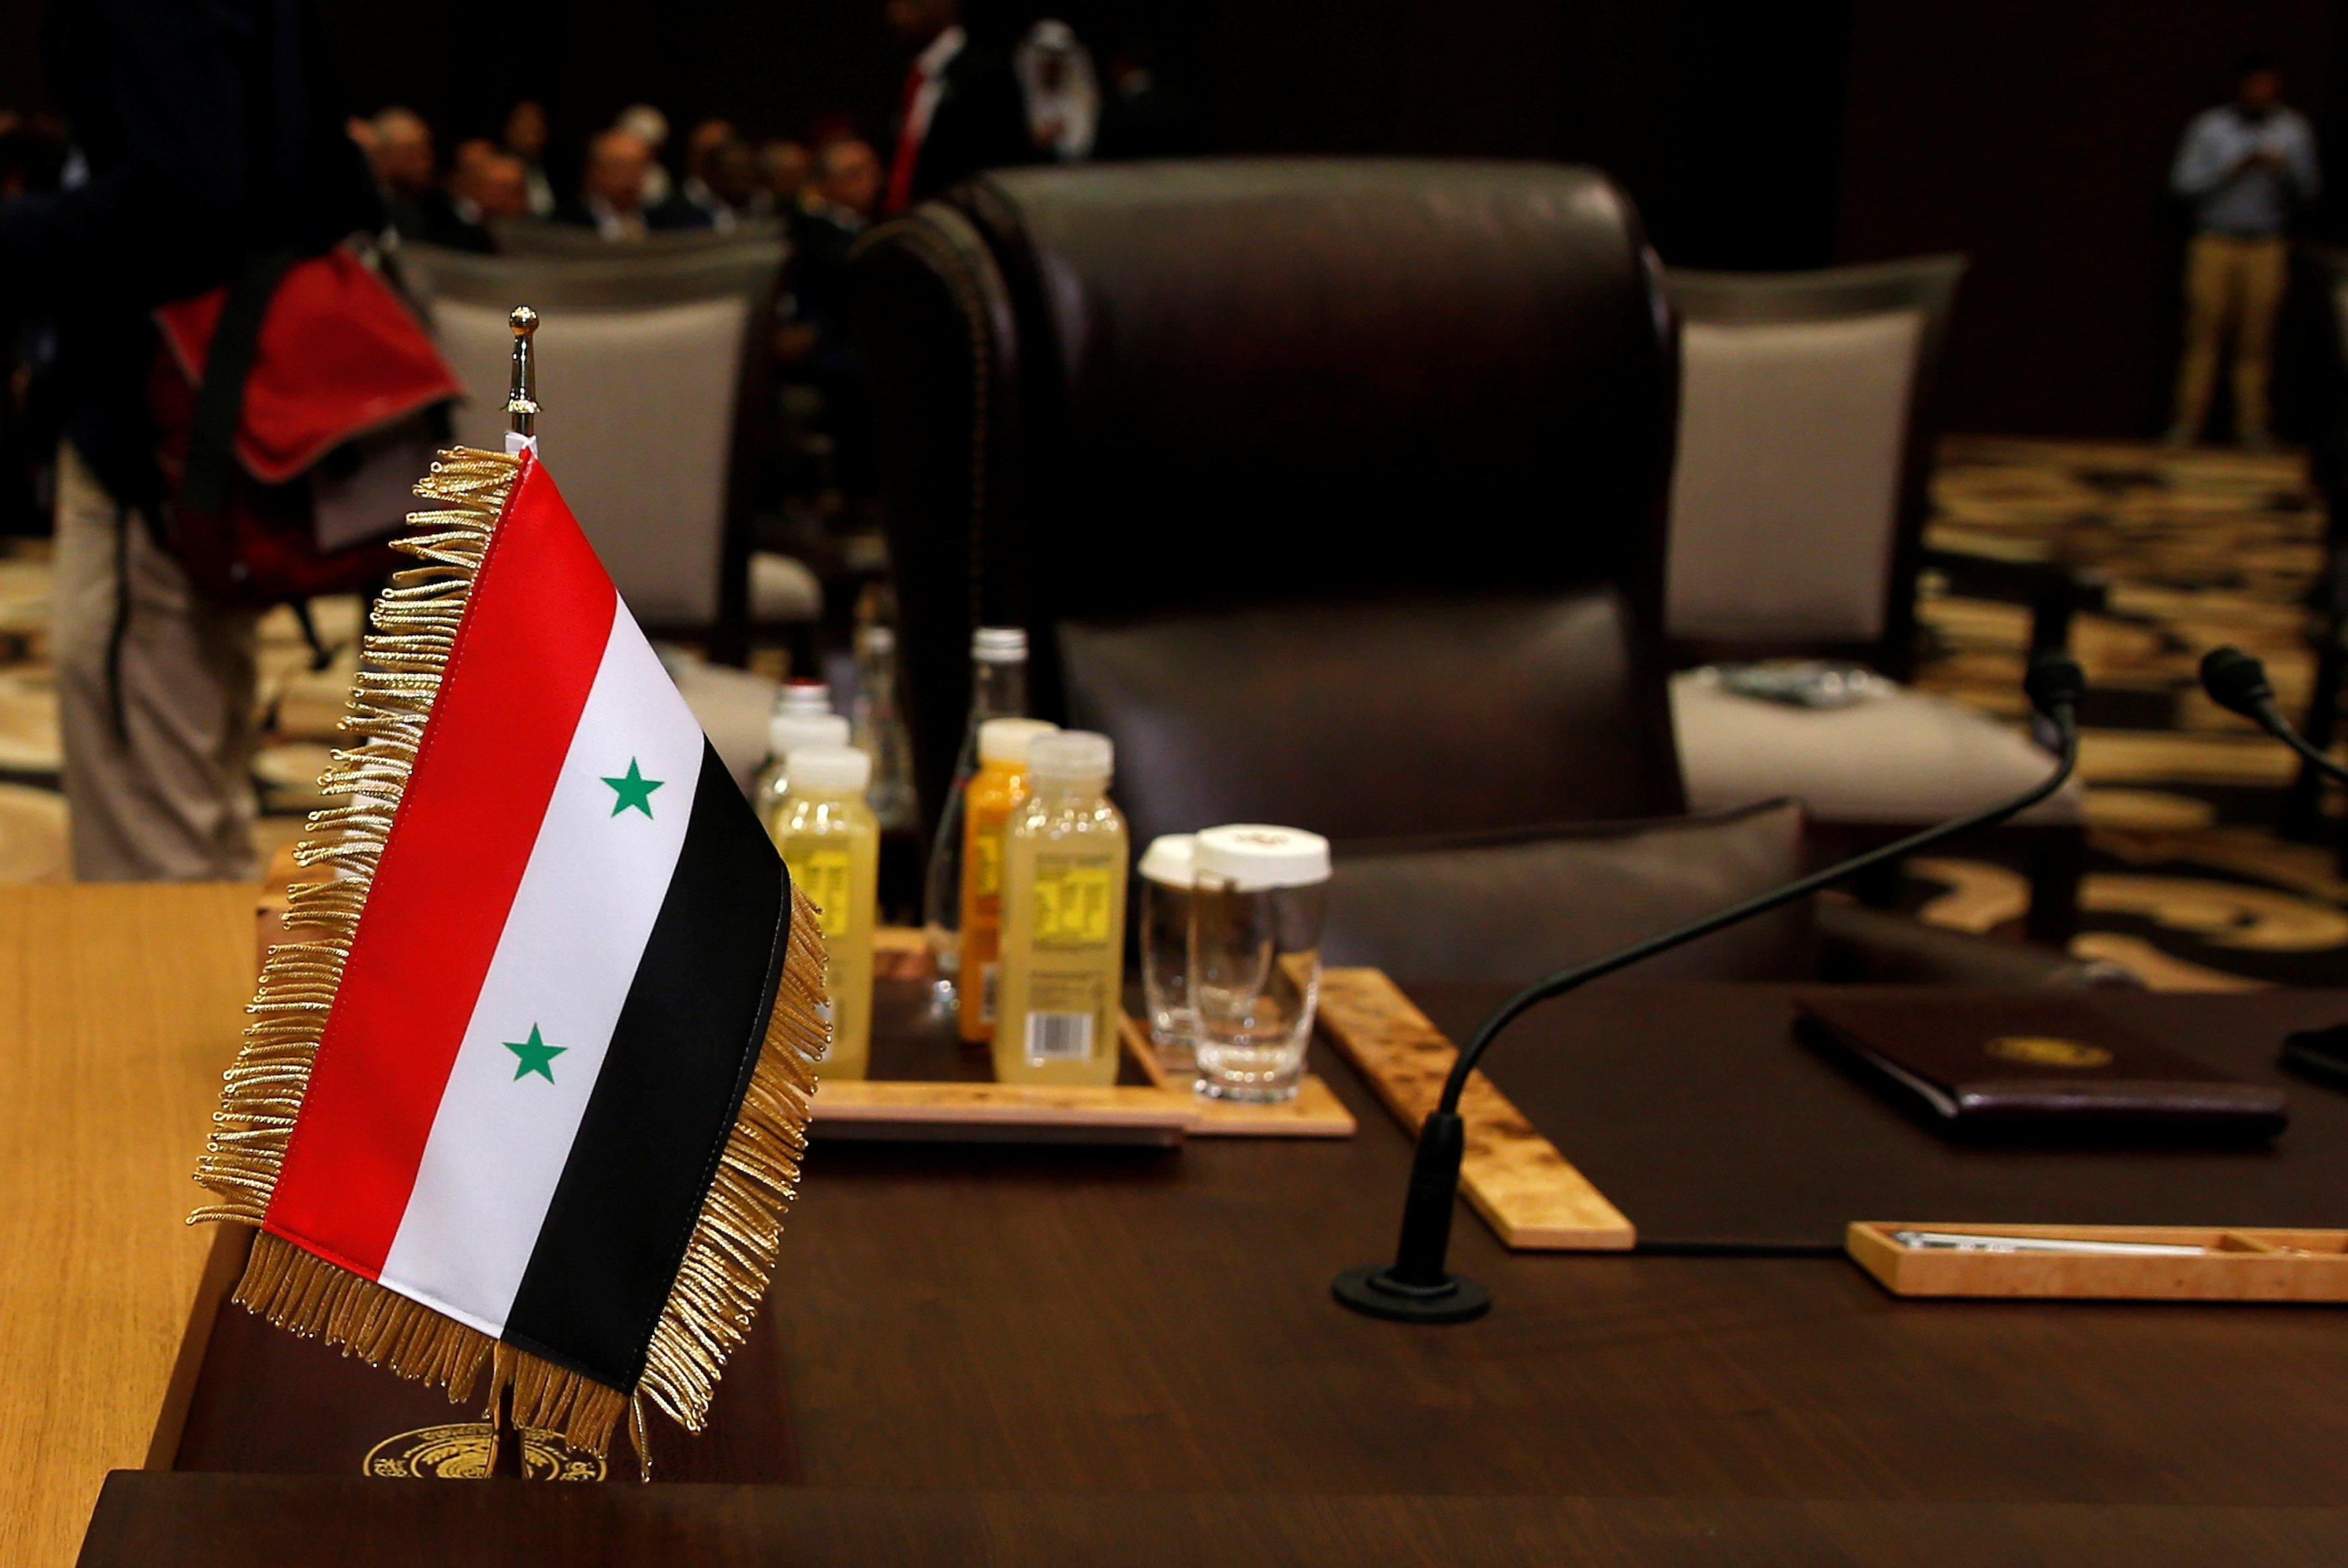 مقعد سوريا الشاغر